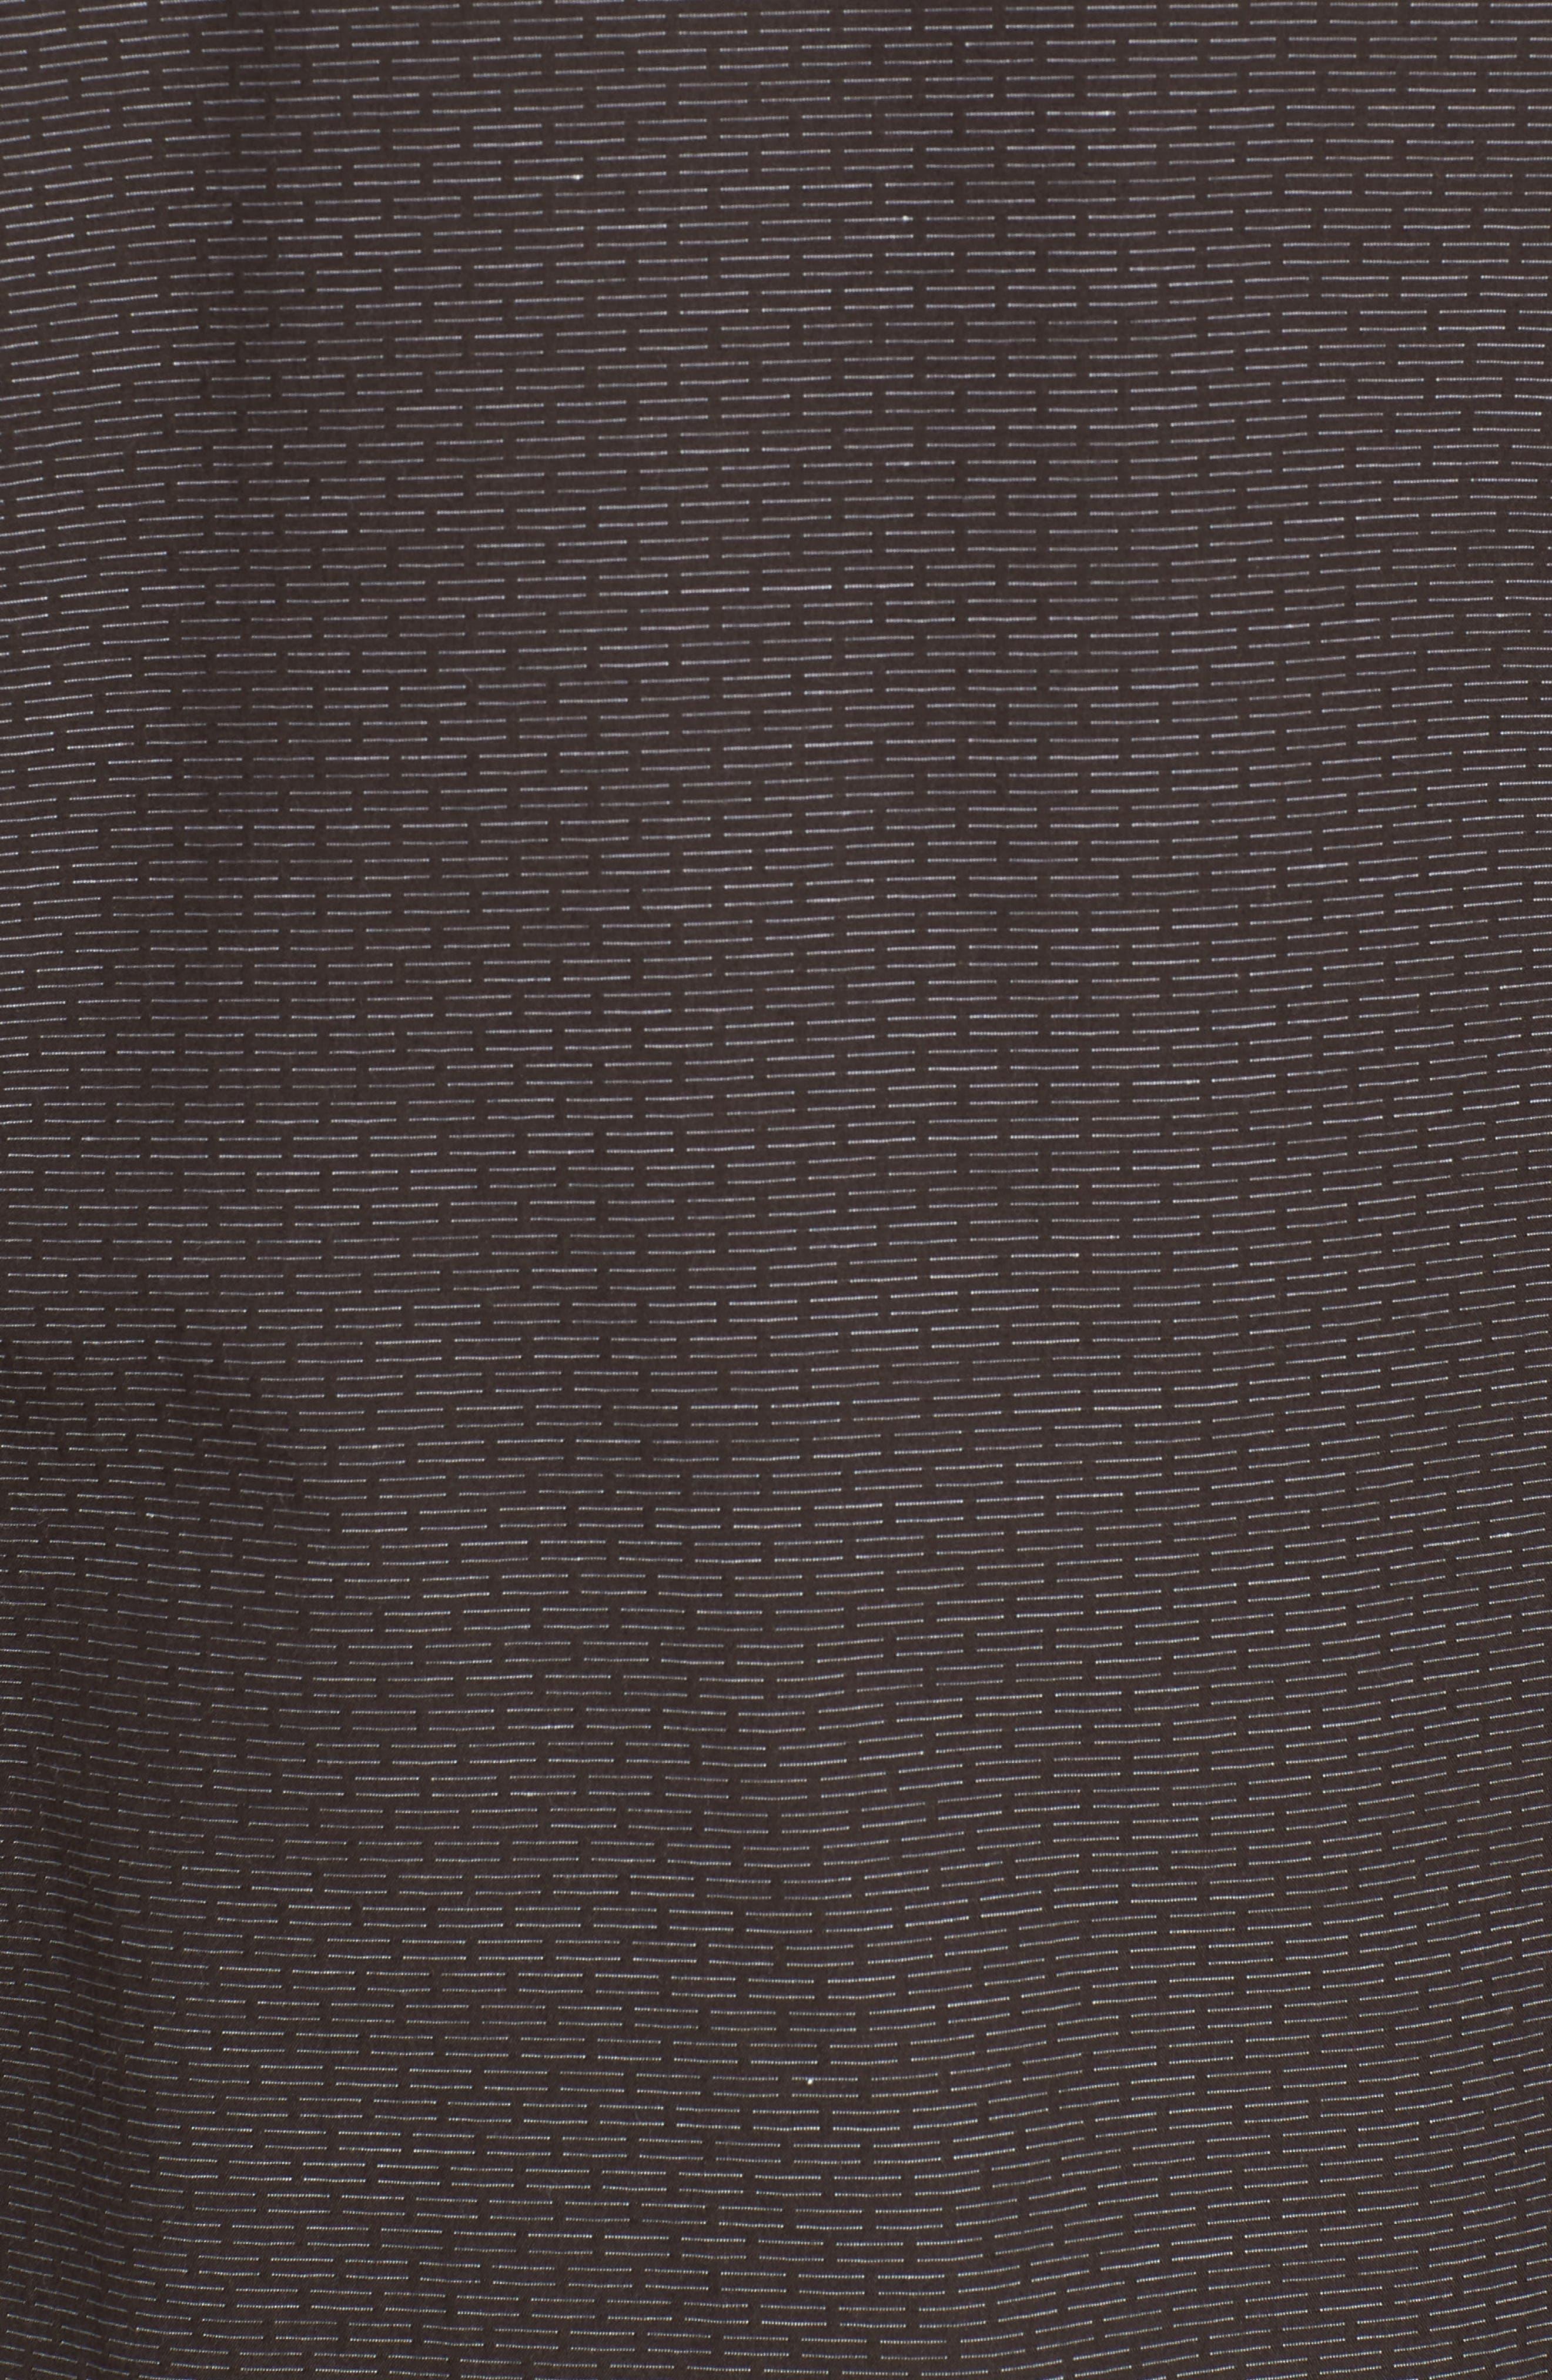 Naked & Famous Dobby Woven Shirt,                             Alternate thumbnail 5, color,                             001